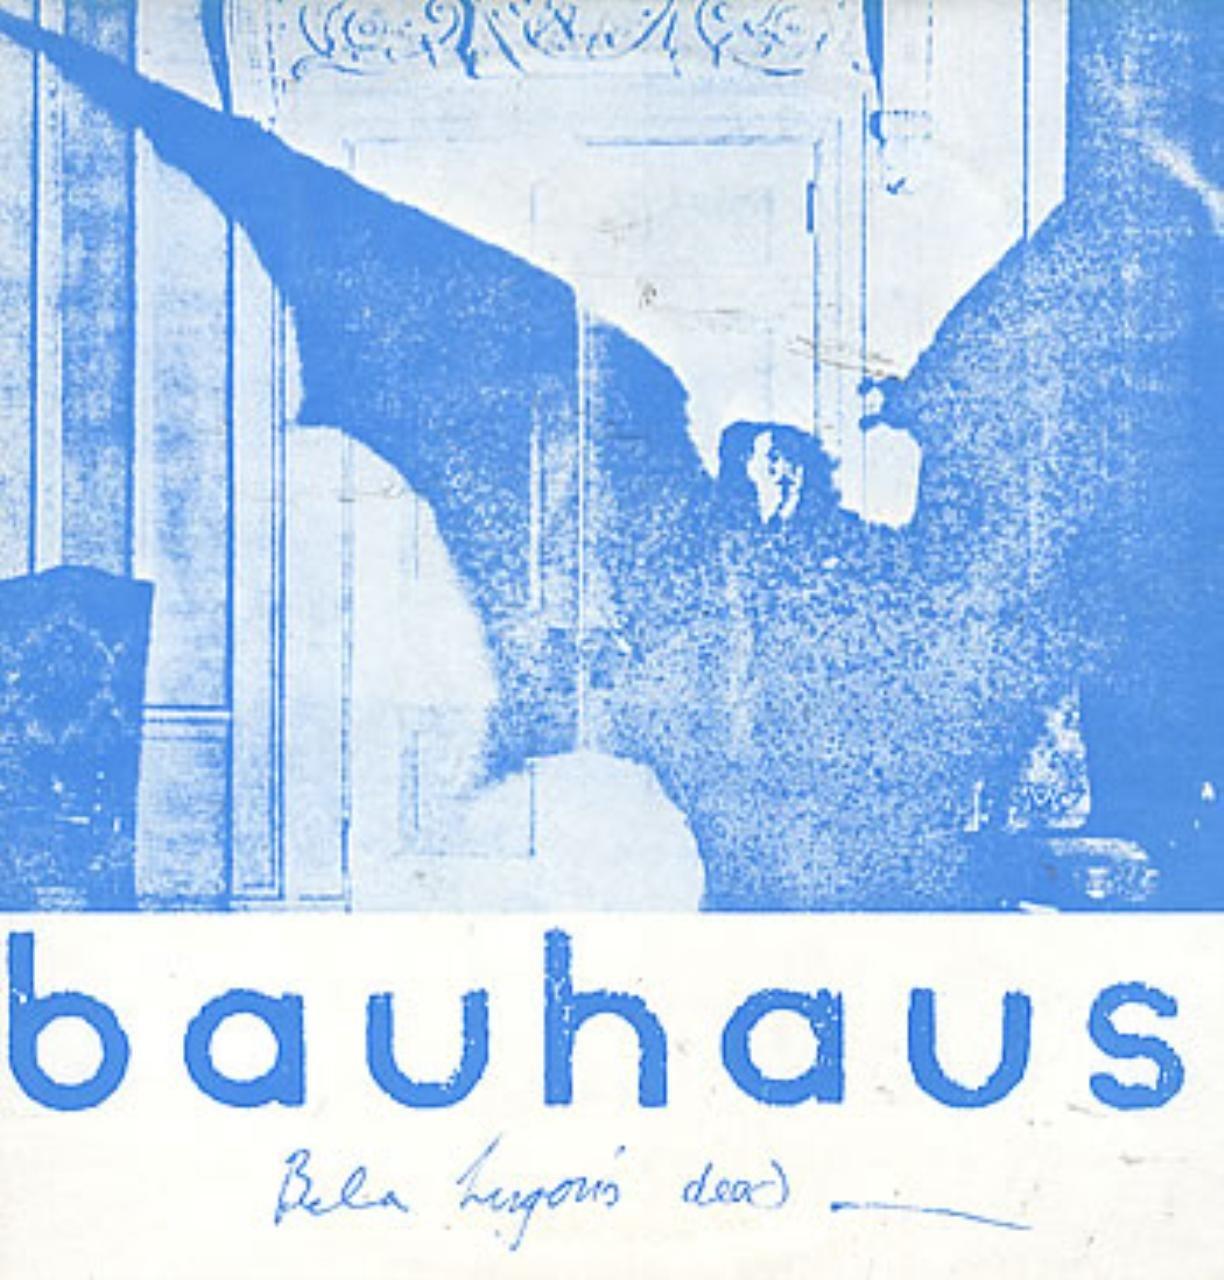 Bela Lugosi's Dead (Blue Vinyl)